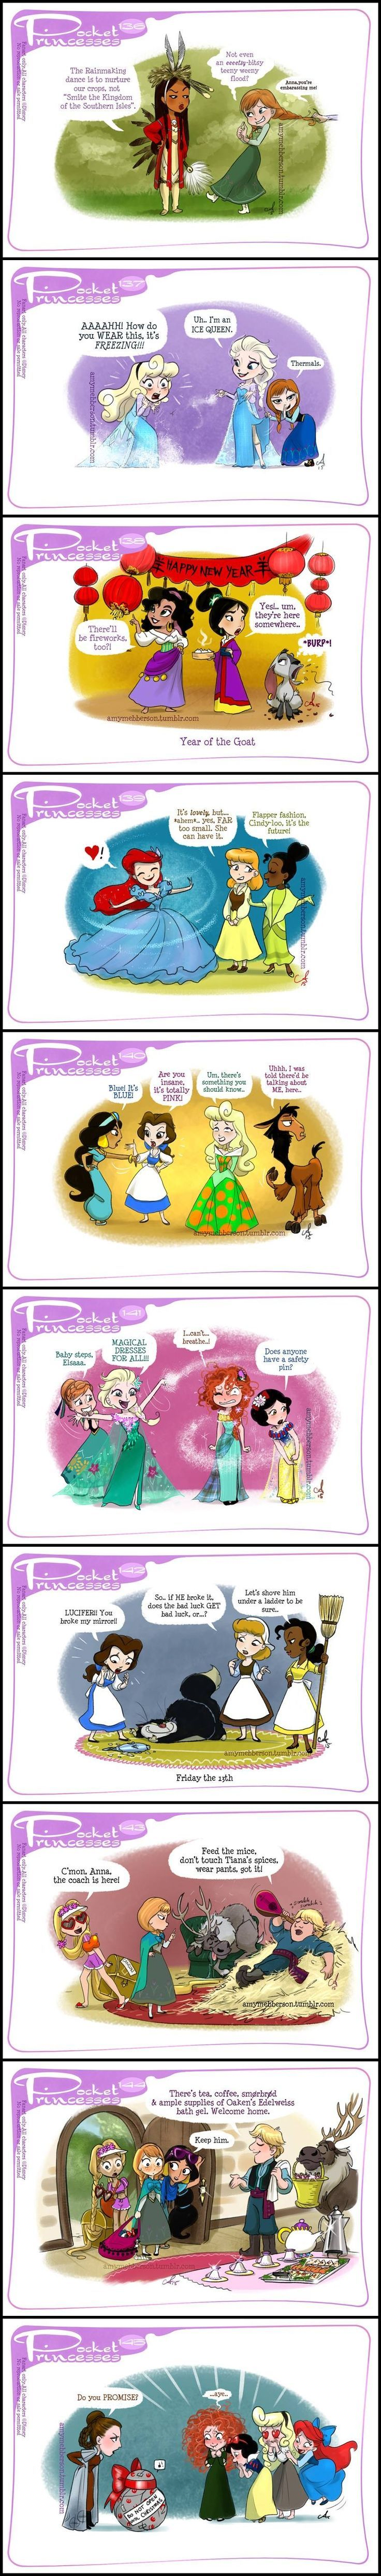 Pocket Princesses (Part 14) by Amy Mebberson: